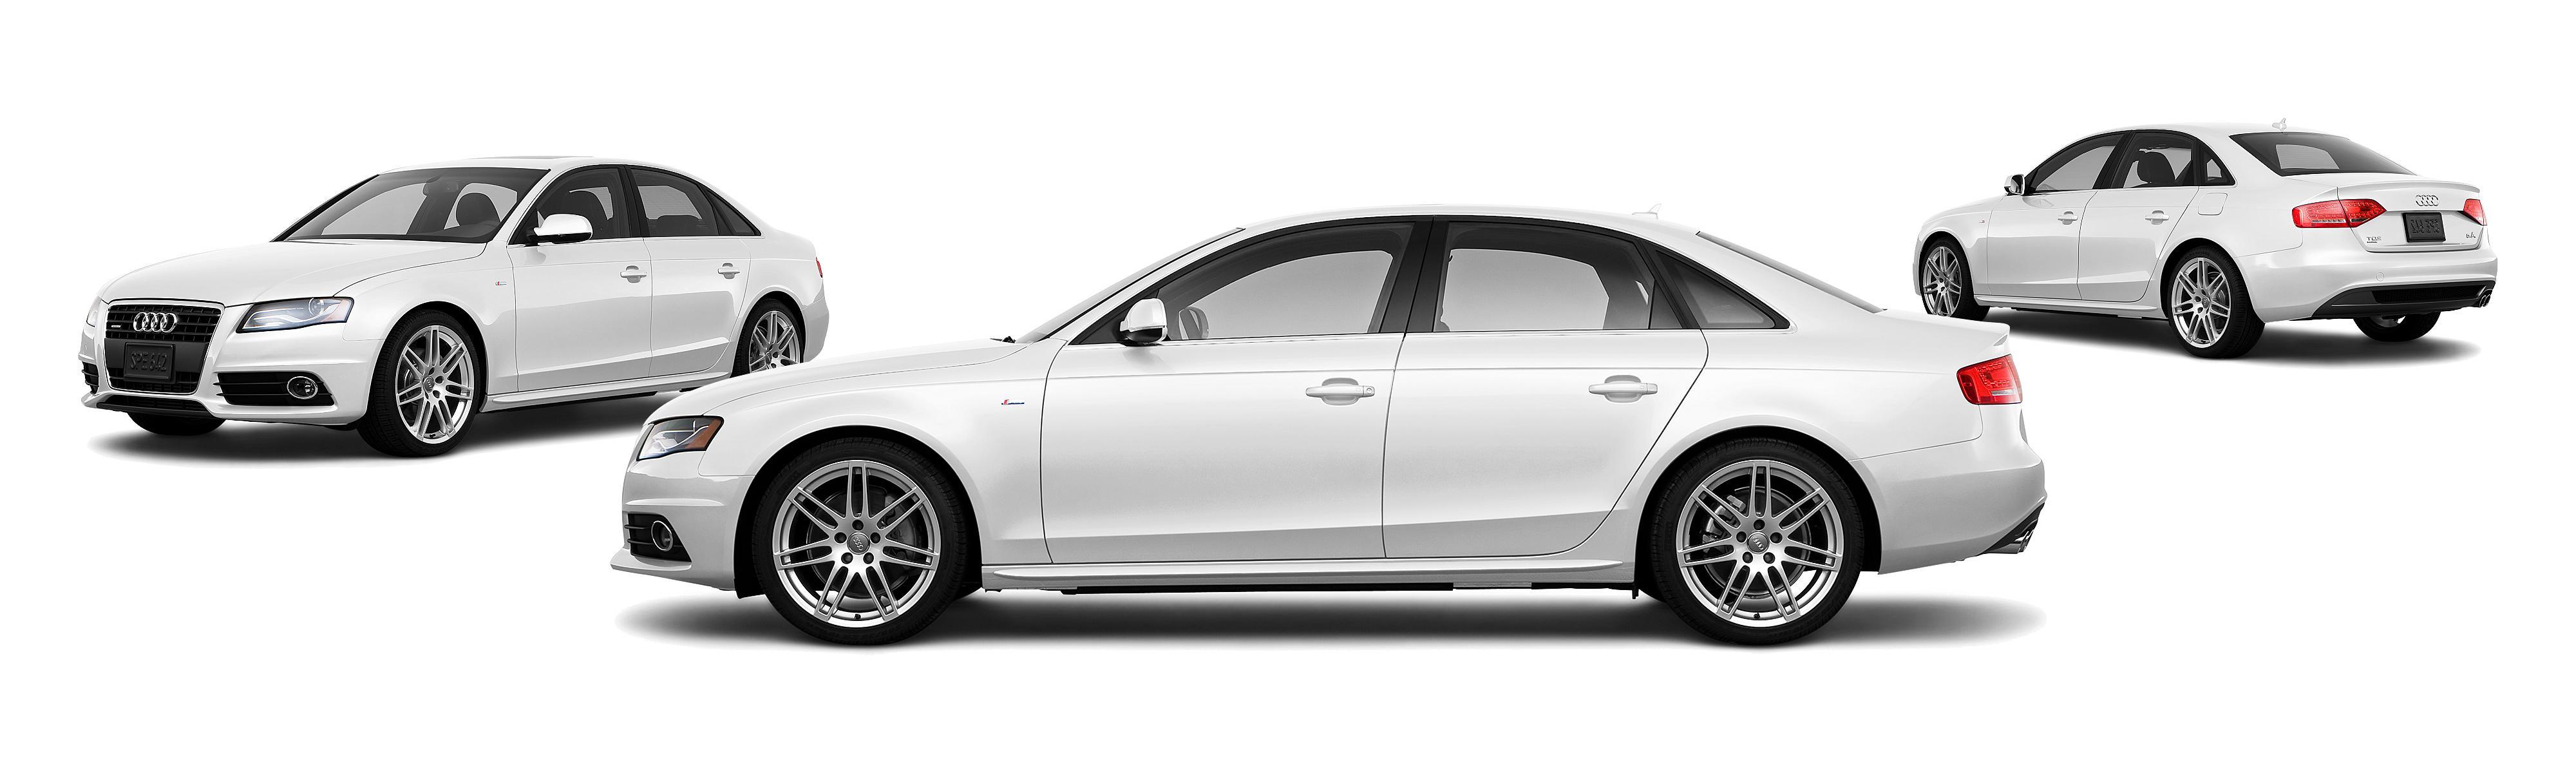 2010 audi a4 awd 2 0t quattro premium plus 4dr sedan 6a research rh groovecar com